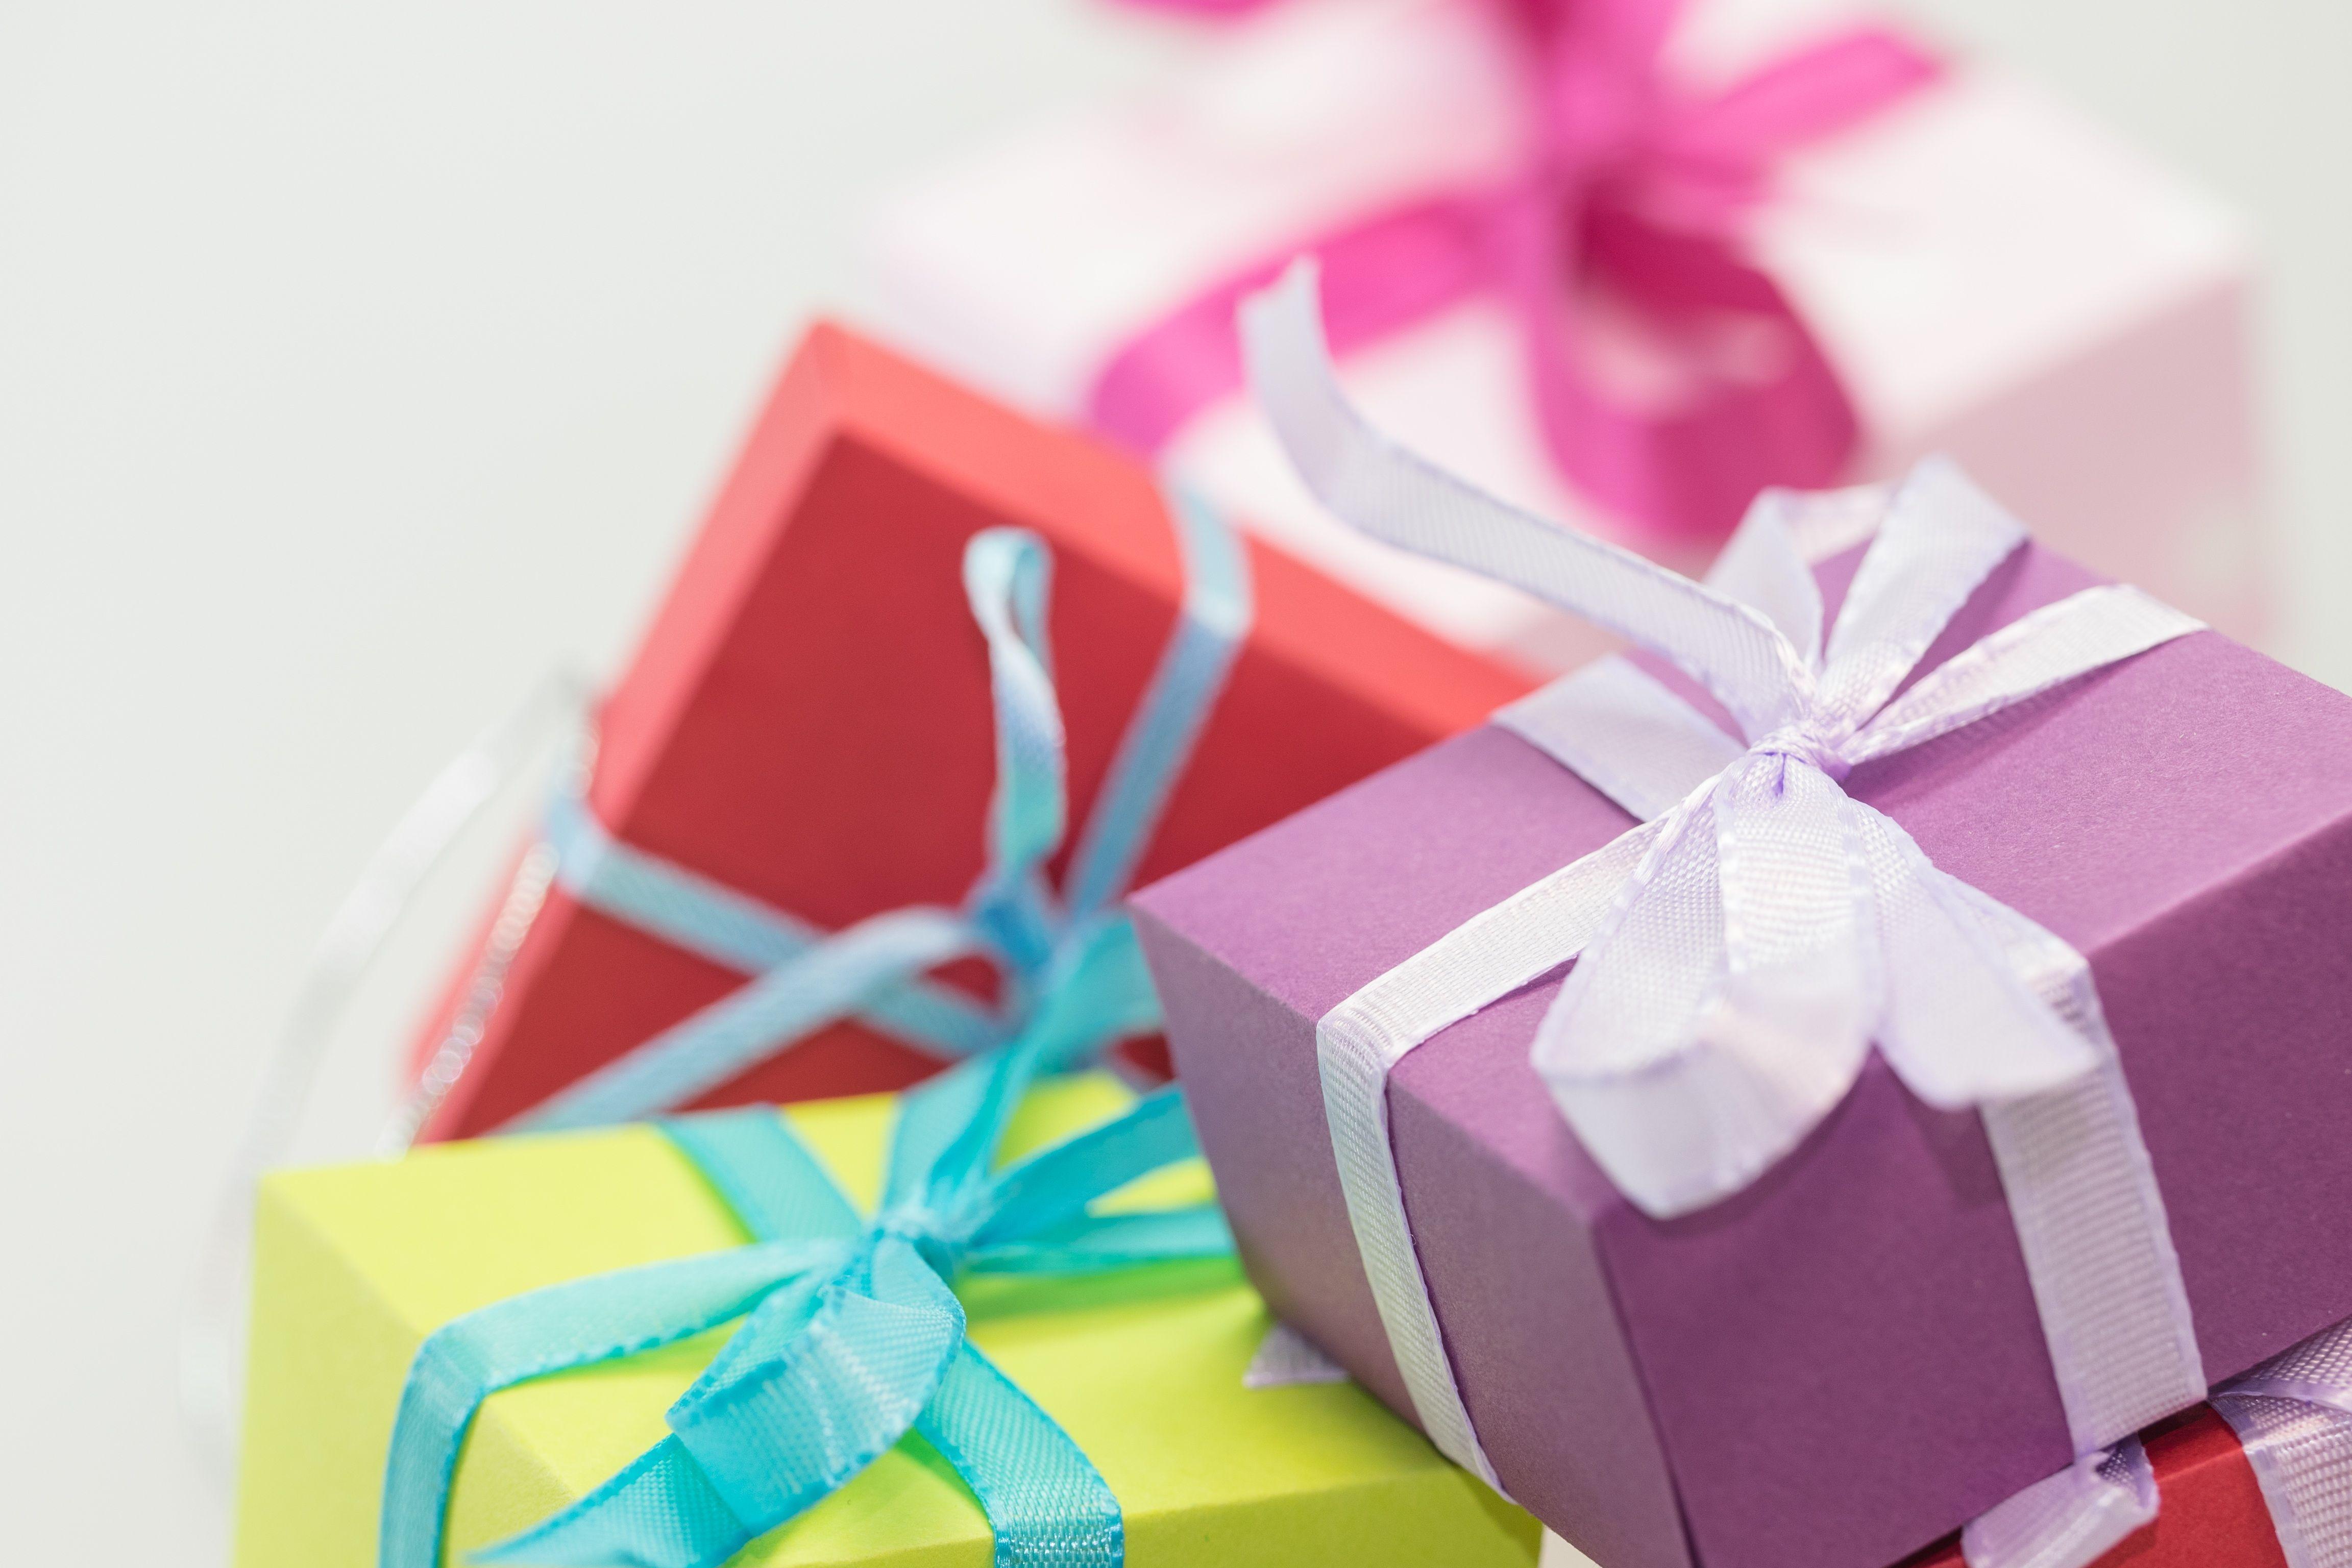 Estas fiestas navideñas regala salud